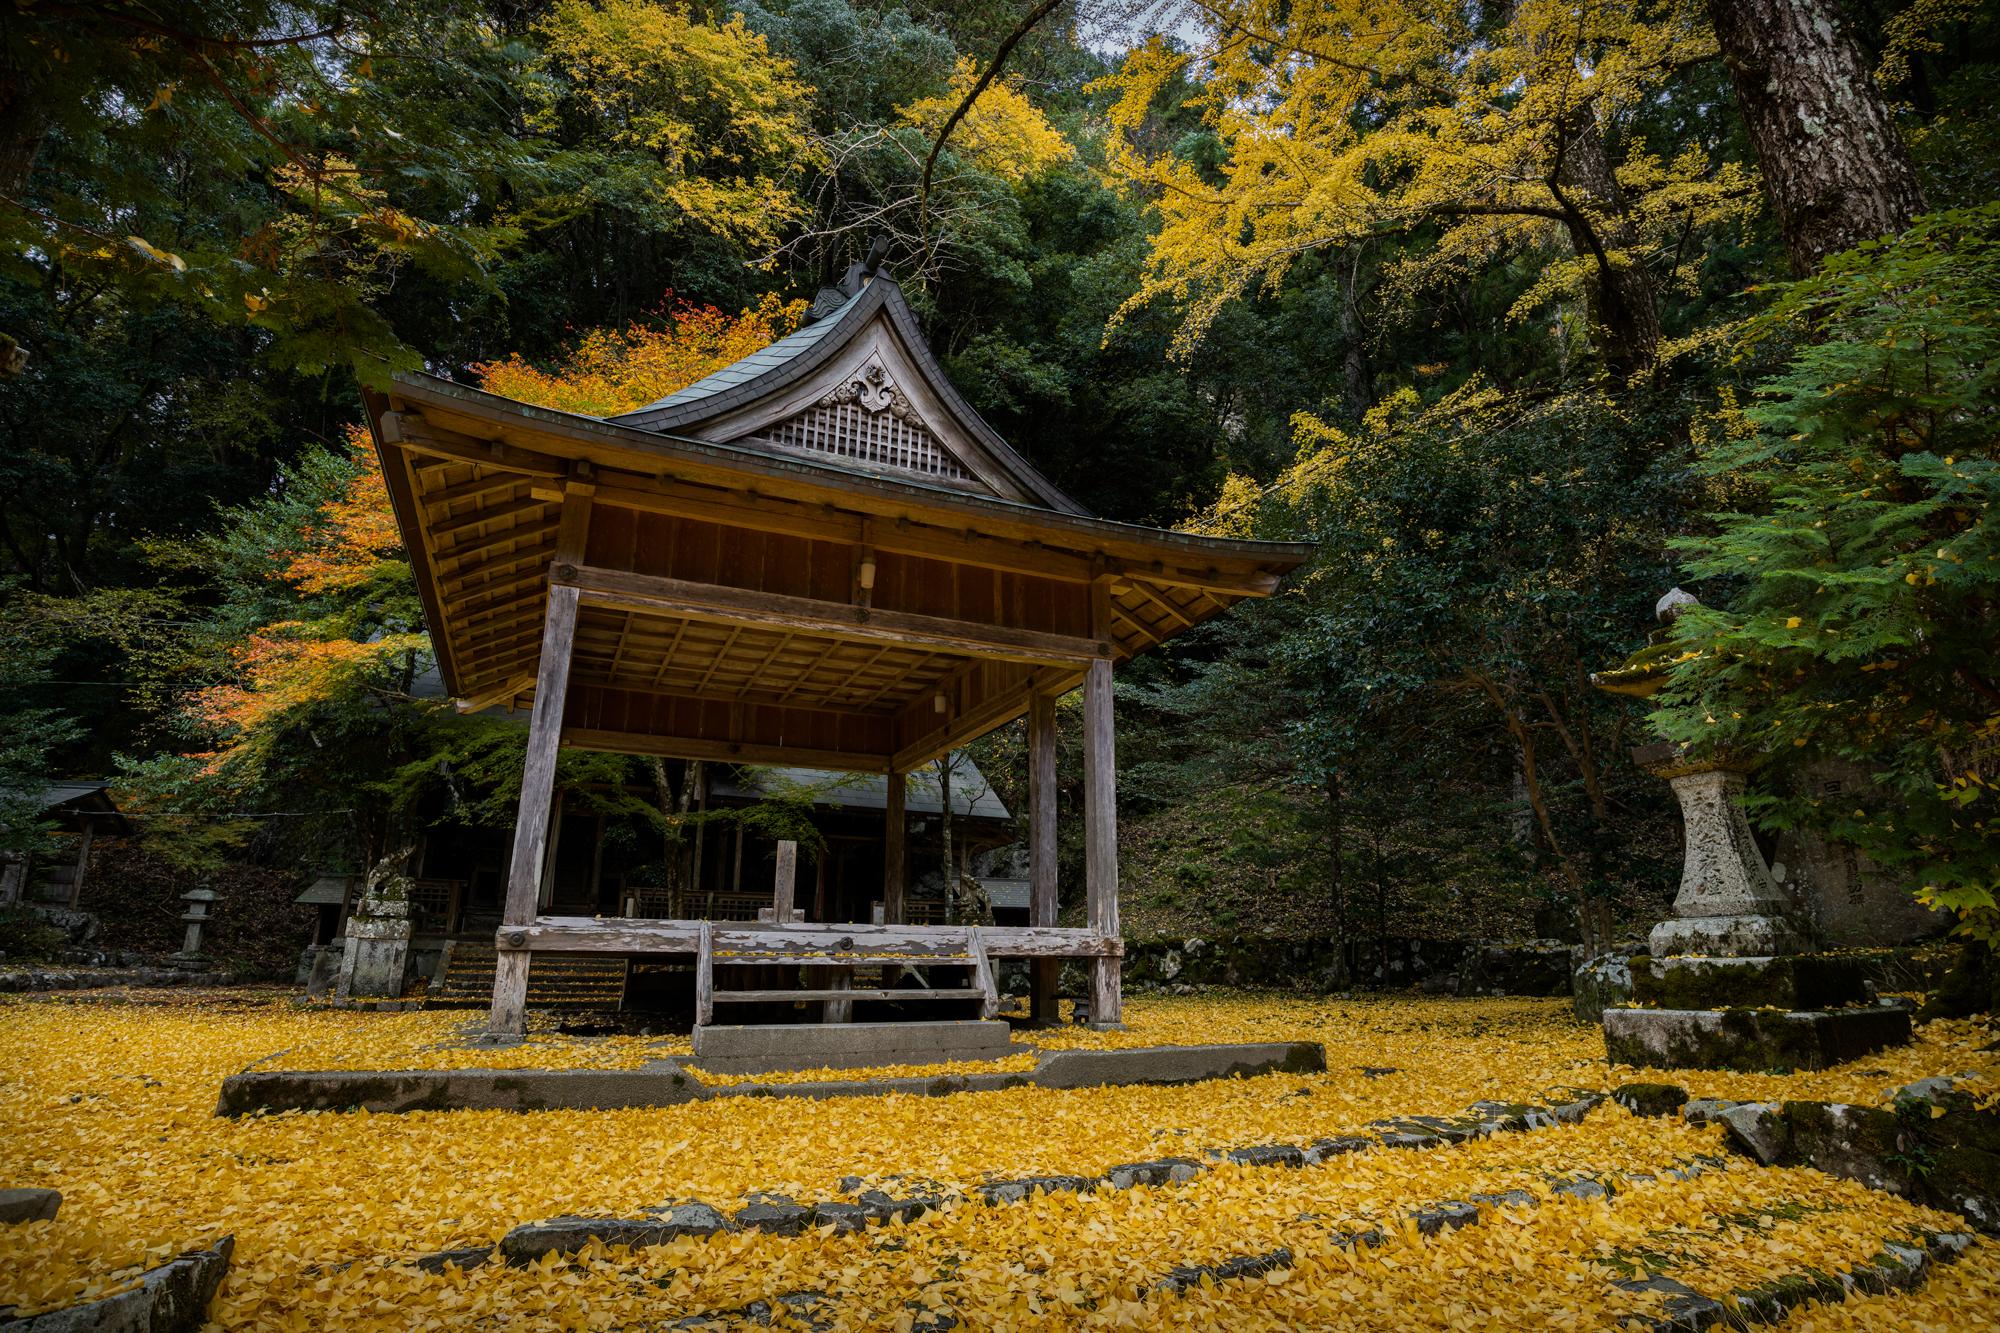 NIKON-CORPORATION_NIKON-D850_3021854322-3021964459_21416 京都  岩戸落葉神社  Kyoto Iwato Ochiba Jinja( 2019年 京都の秋、境内が黄色の絨毯に染まるイチョウのおすすめの写真スポット・アクセス情報や交通手段など!)